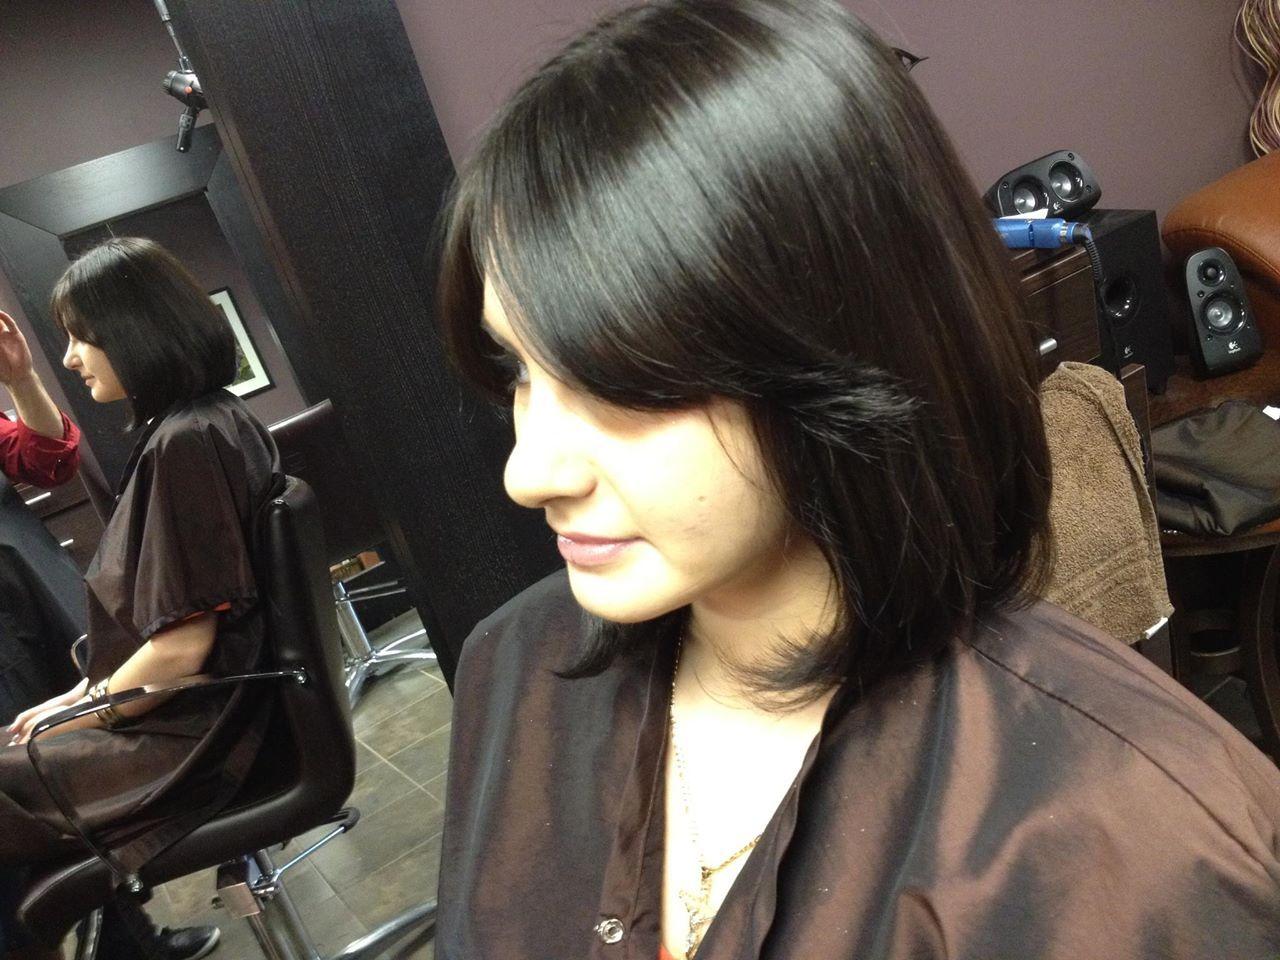 Hair cutting and head shaving stories - Indian Headshave Stories Shika S Bobcut Shorter Hairhaircutsbobshair